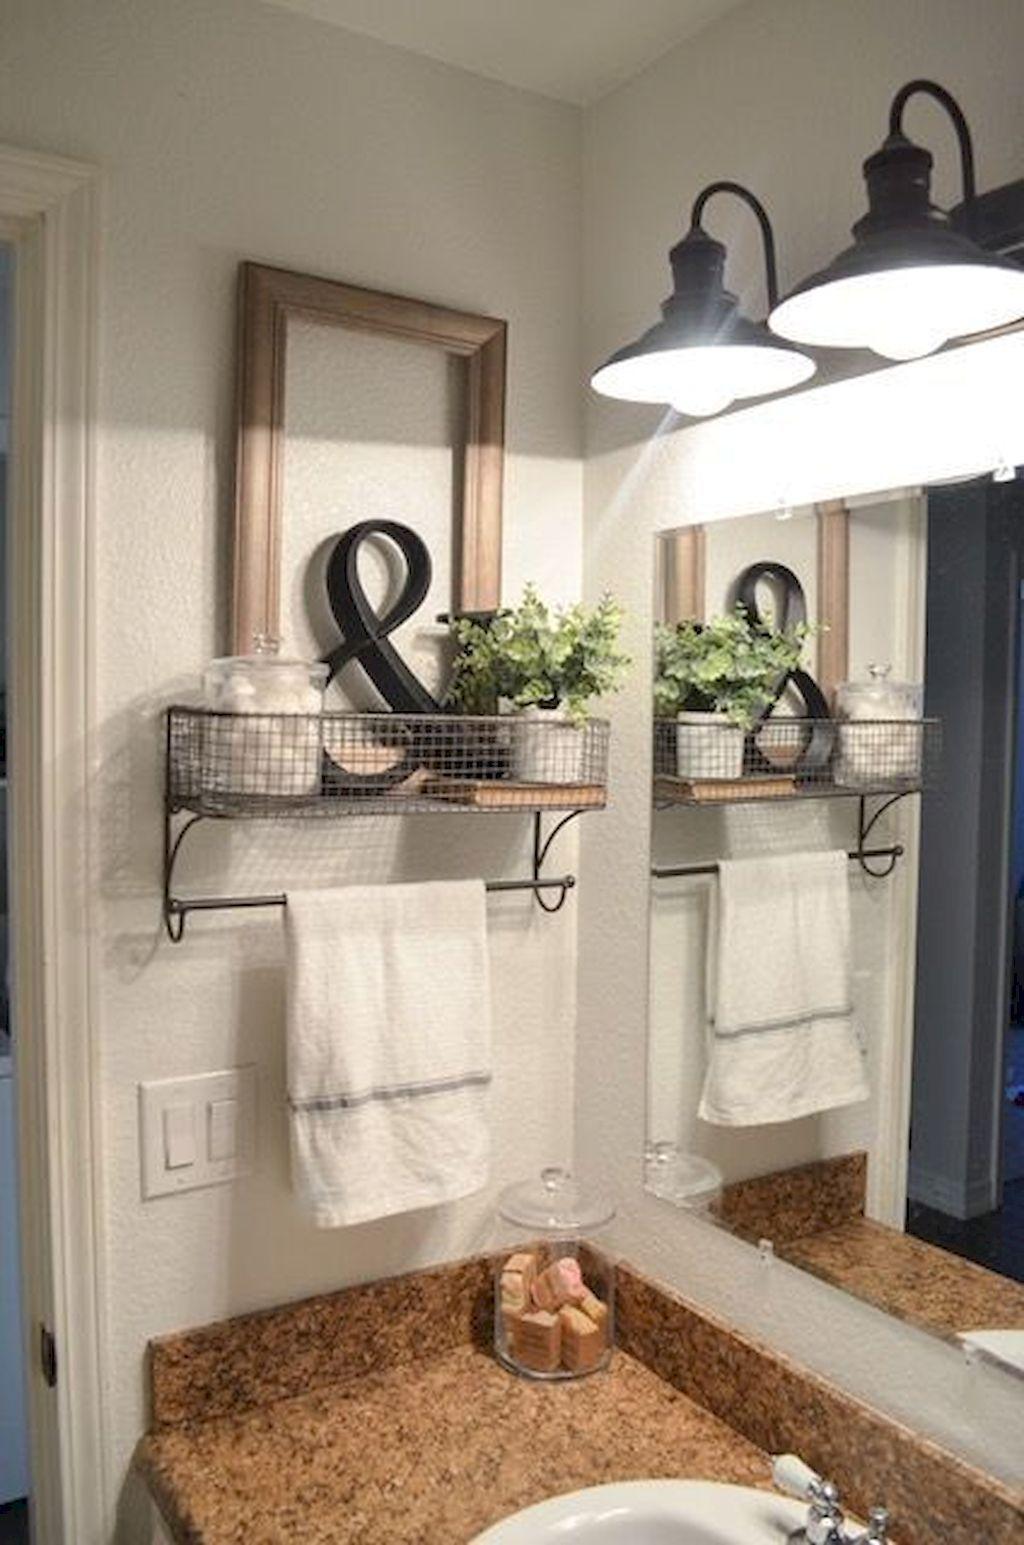 59 Farmhouse Rustic Master Bathroom Remodel Ideas | Pinterest ...